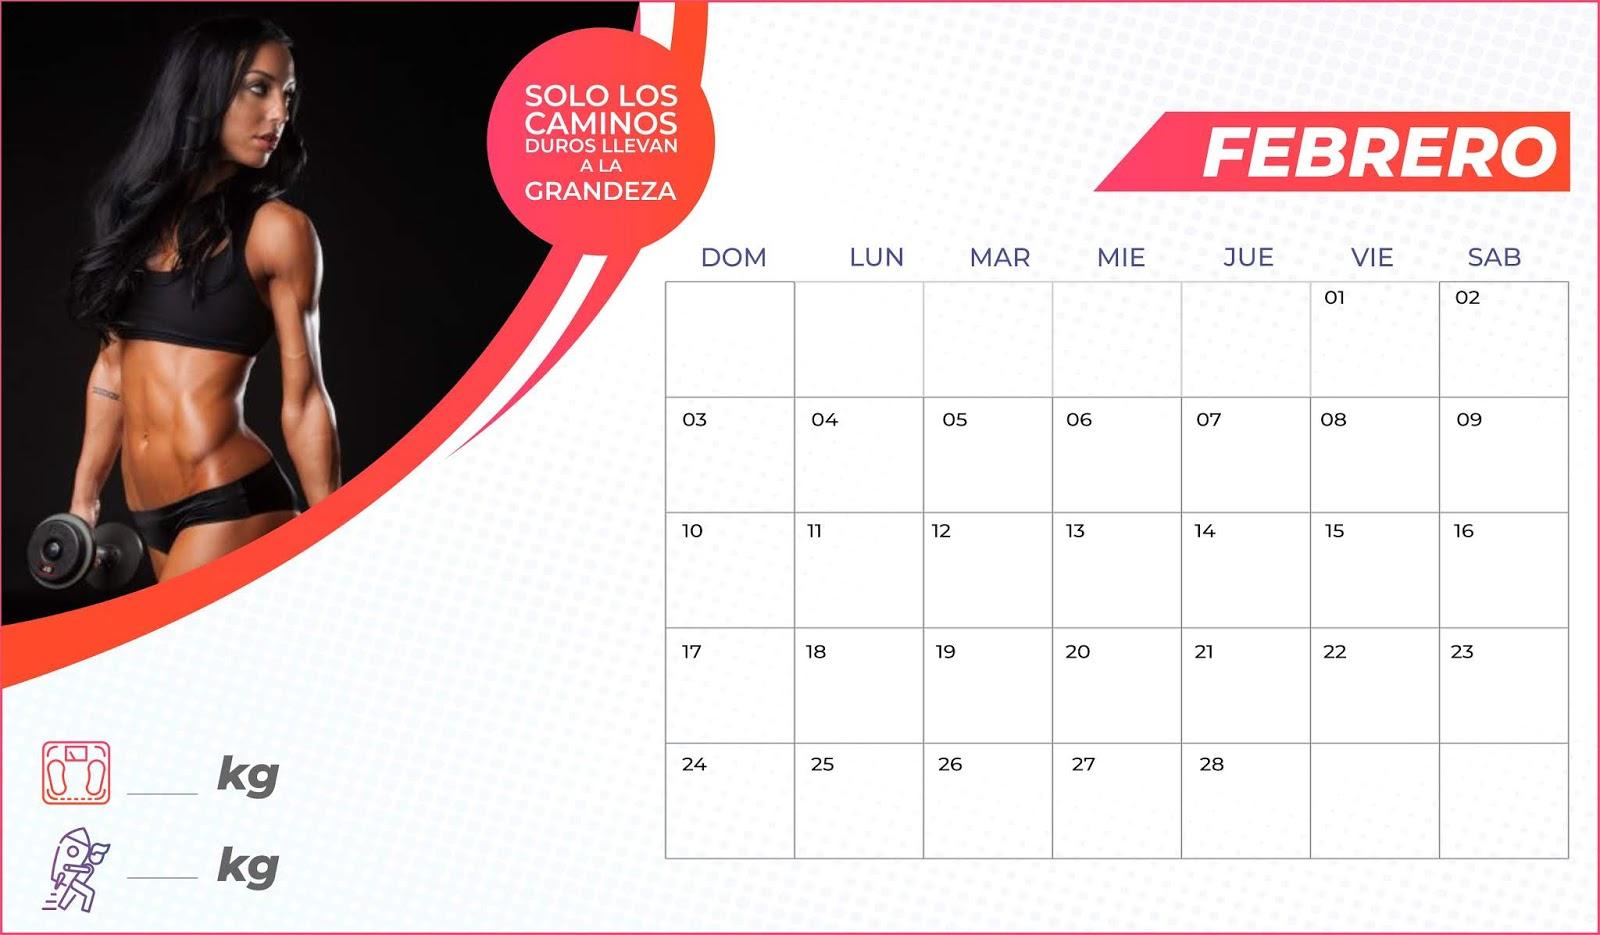 Calendario Fitness 2019.Calendario Fitness Mujer 8 5x14